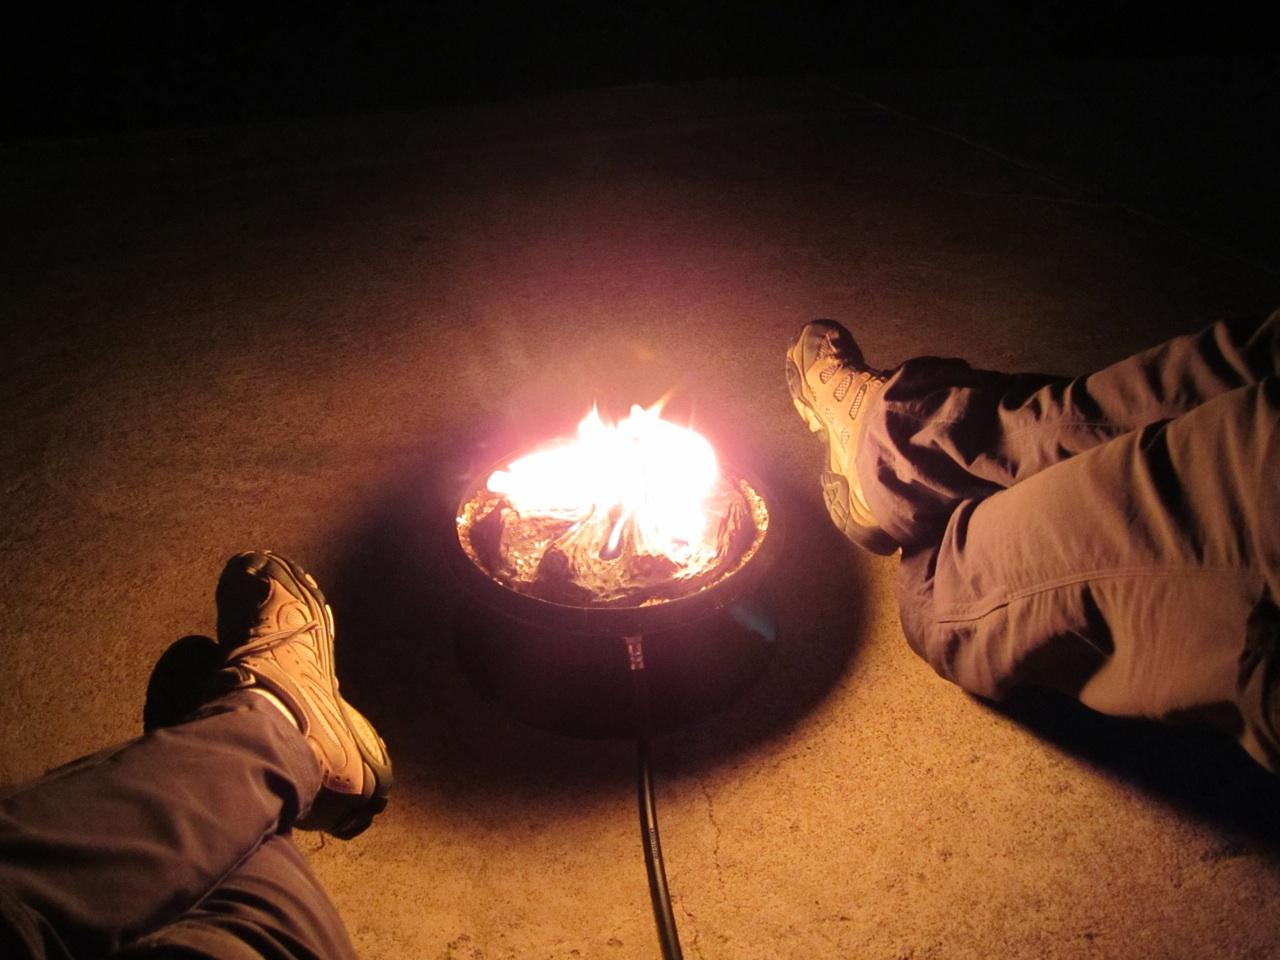 Our Portable Campfire